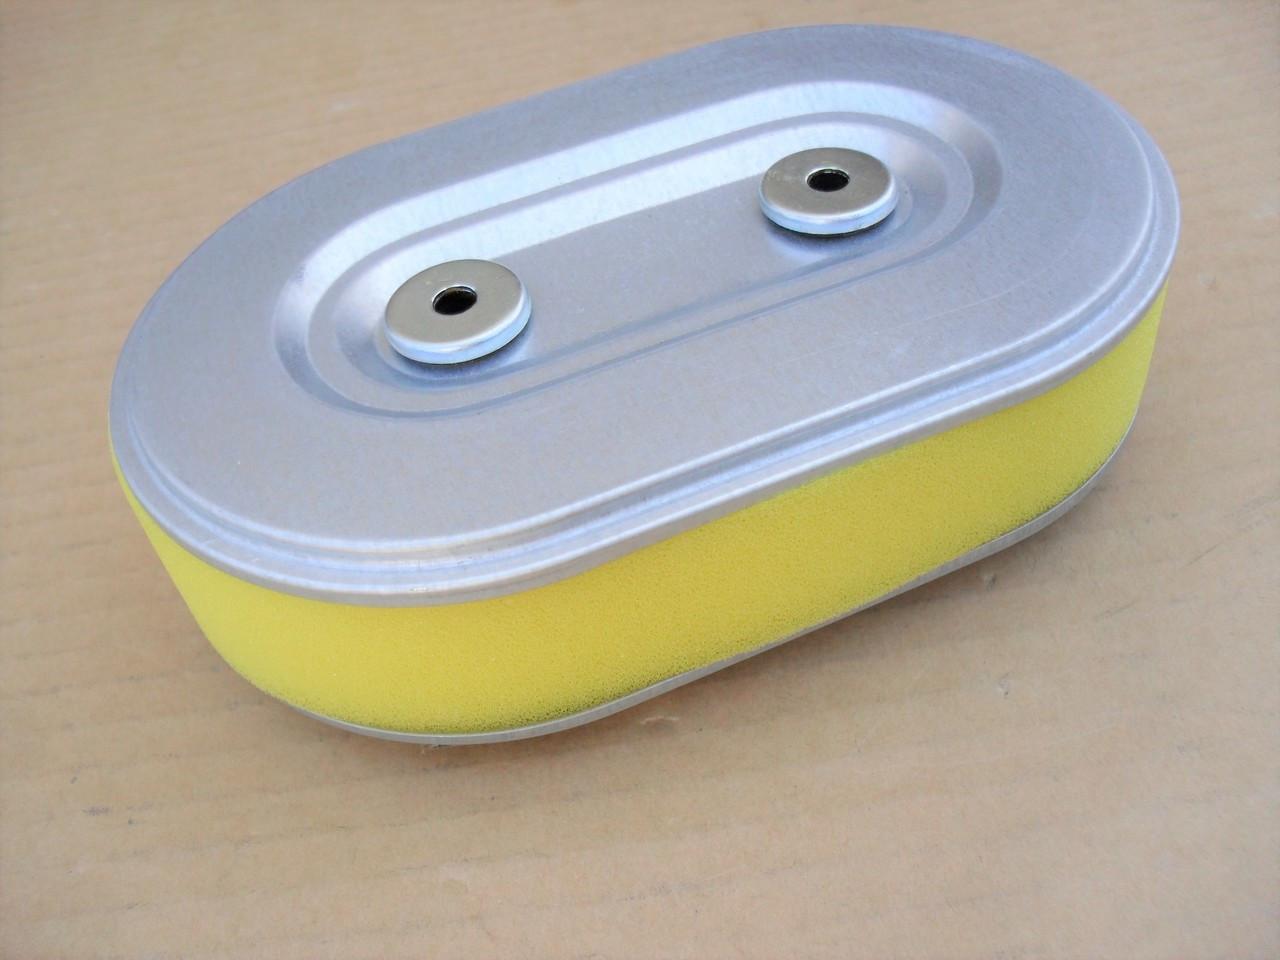 Air Filter for Honda GX360K1, HT3813, 4213 Tractor 17210ZA0506, 17210ZAO506, 17211ZA0702, 17210-ZA0-506, 17210-ZAO-506, 17211-ZA0-702